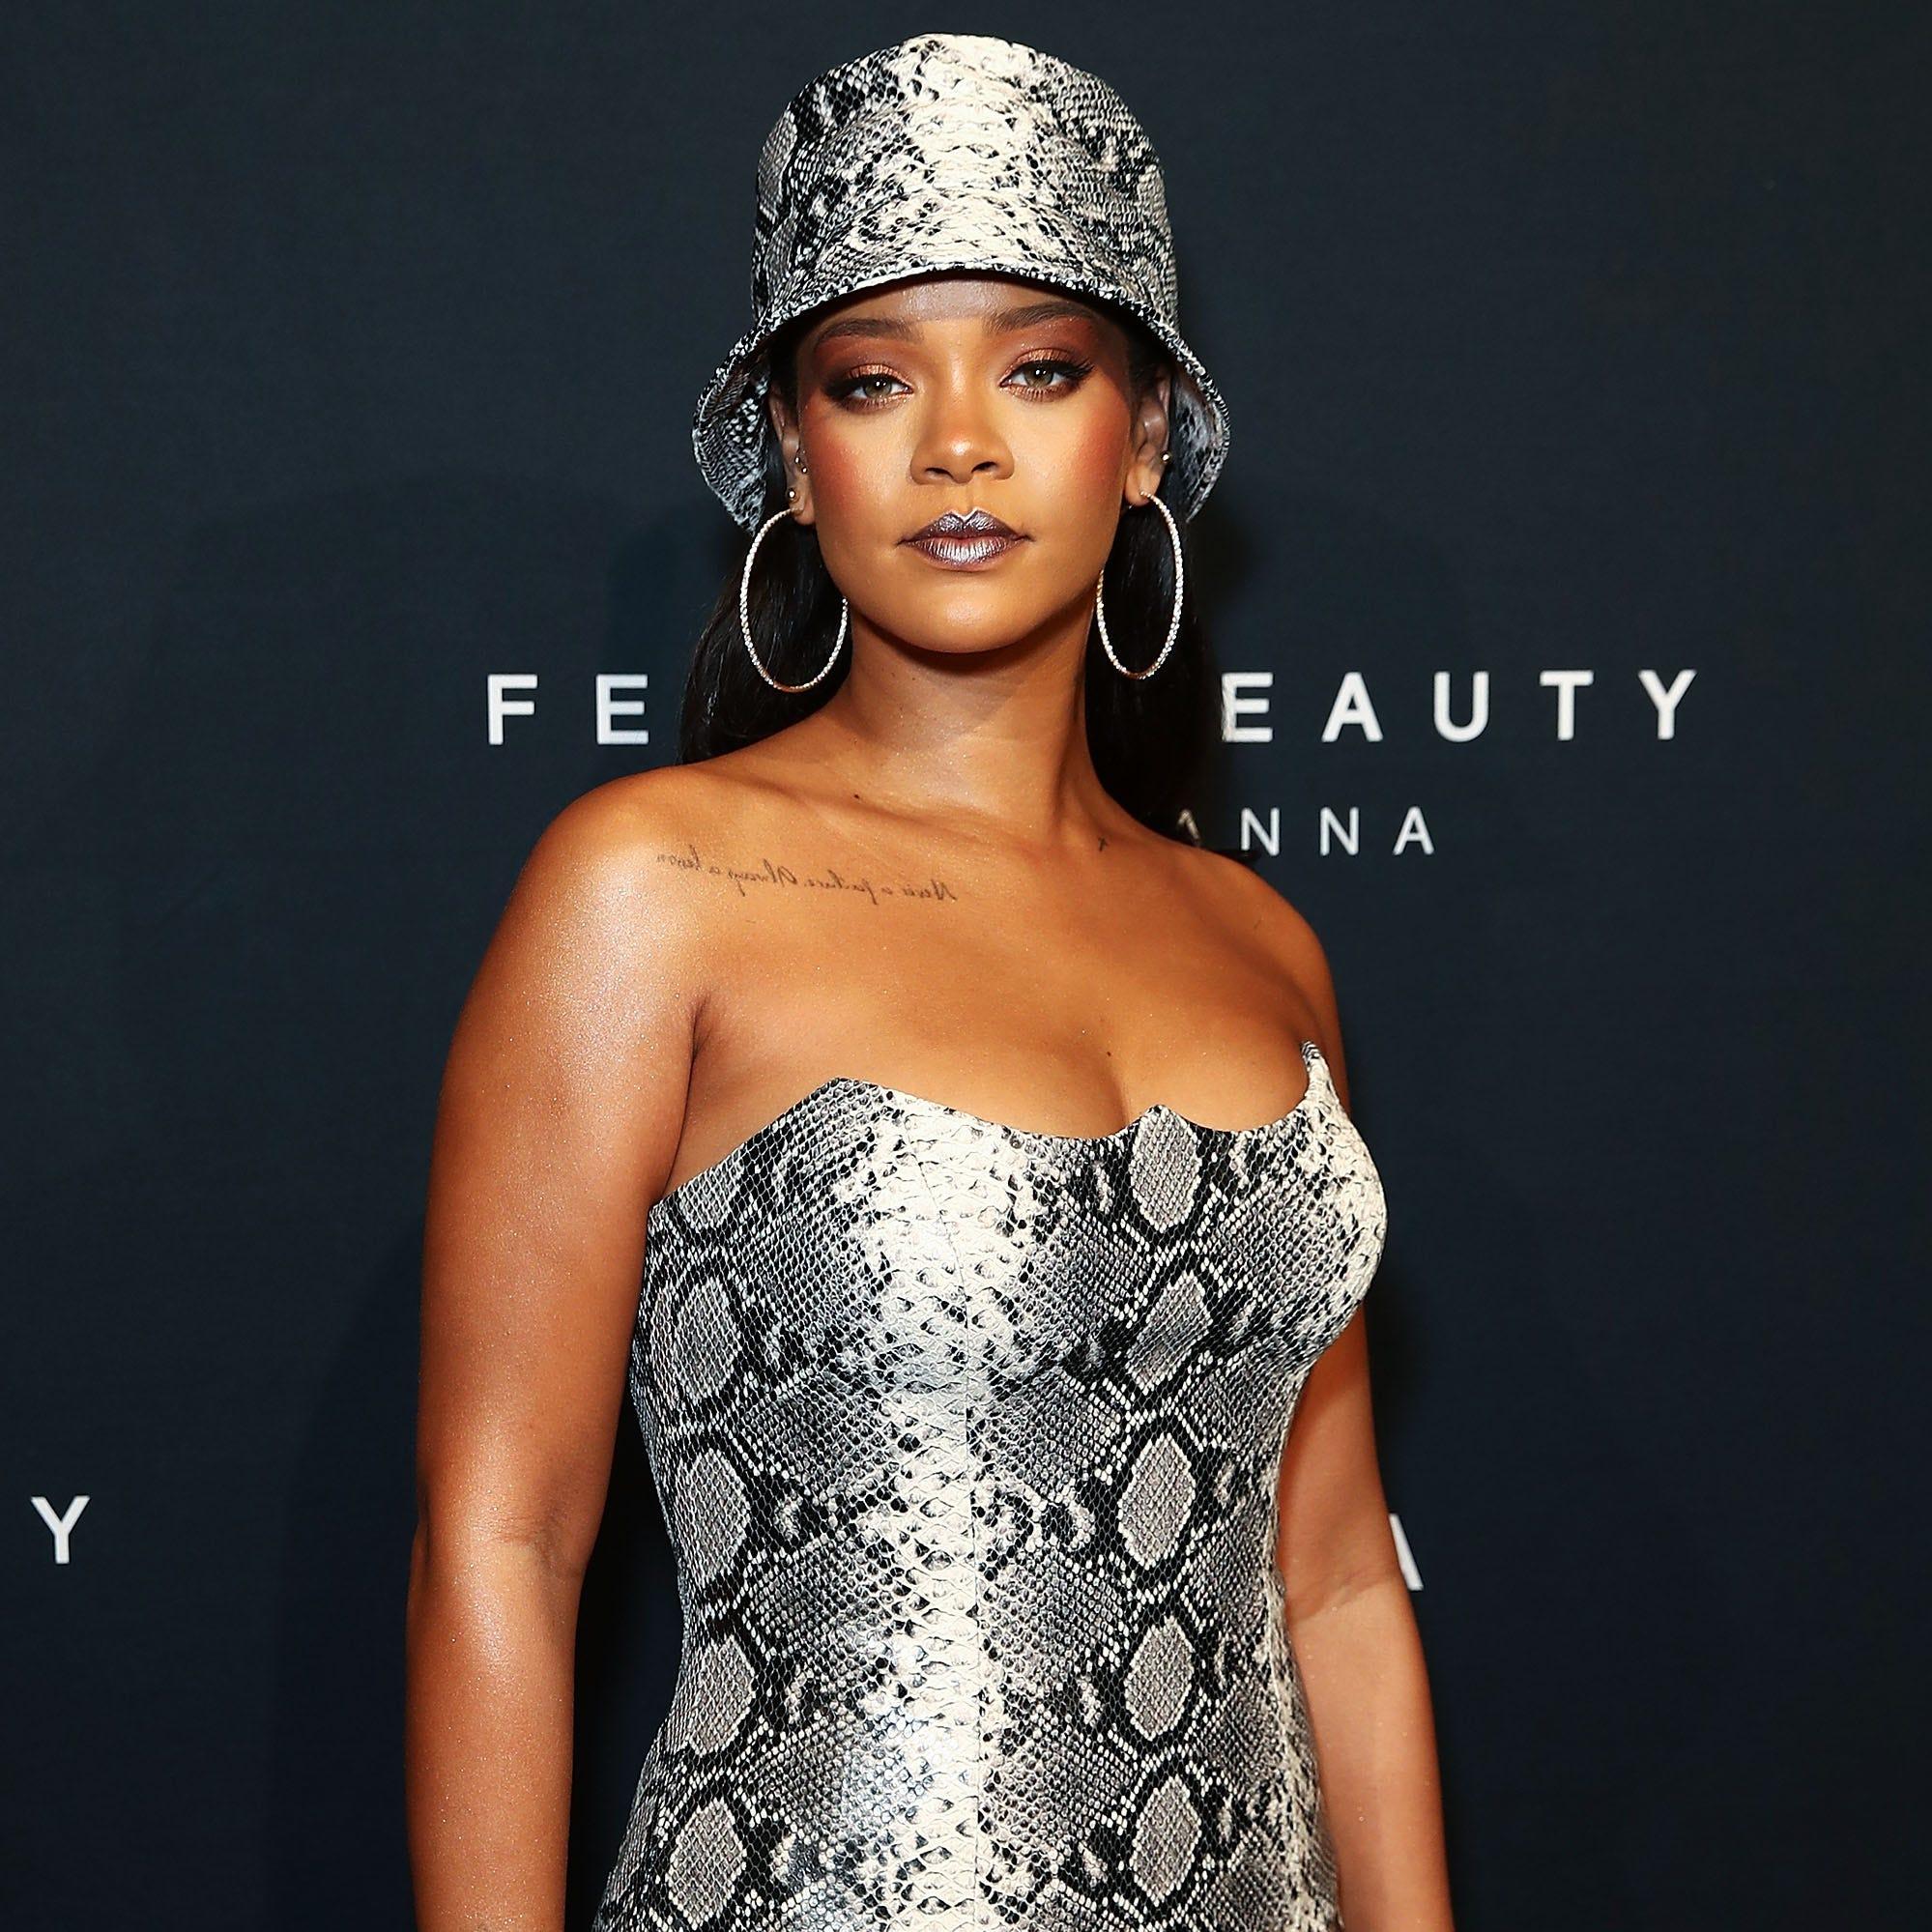 Can Rihanna make President Donald Trump 'Stop the Music?'